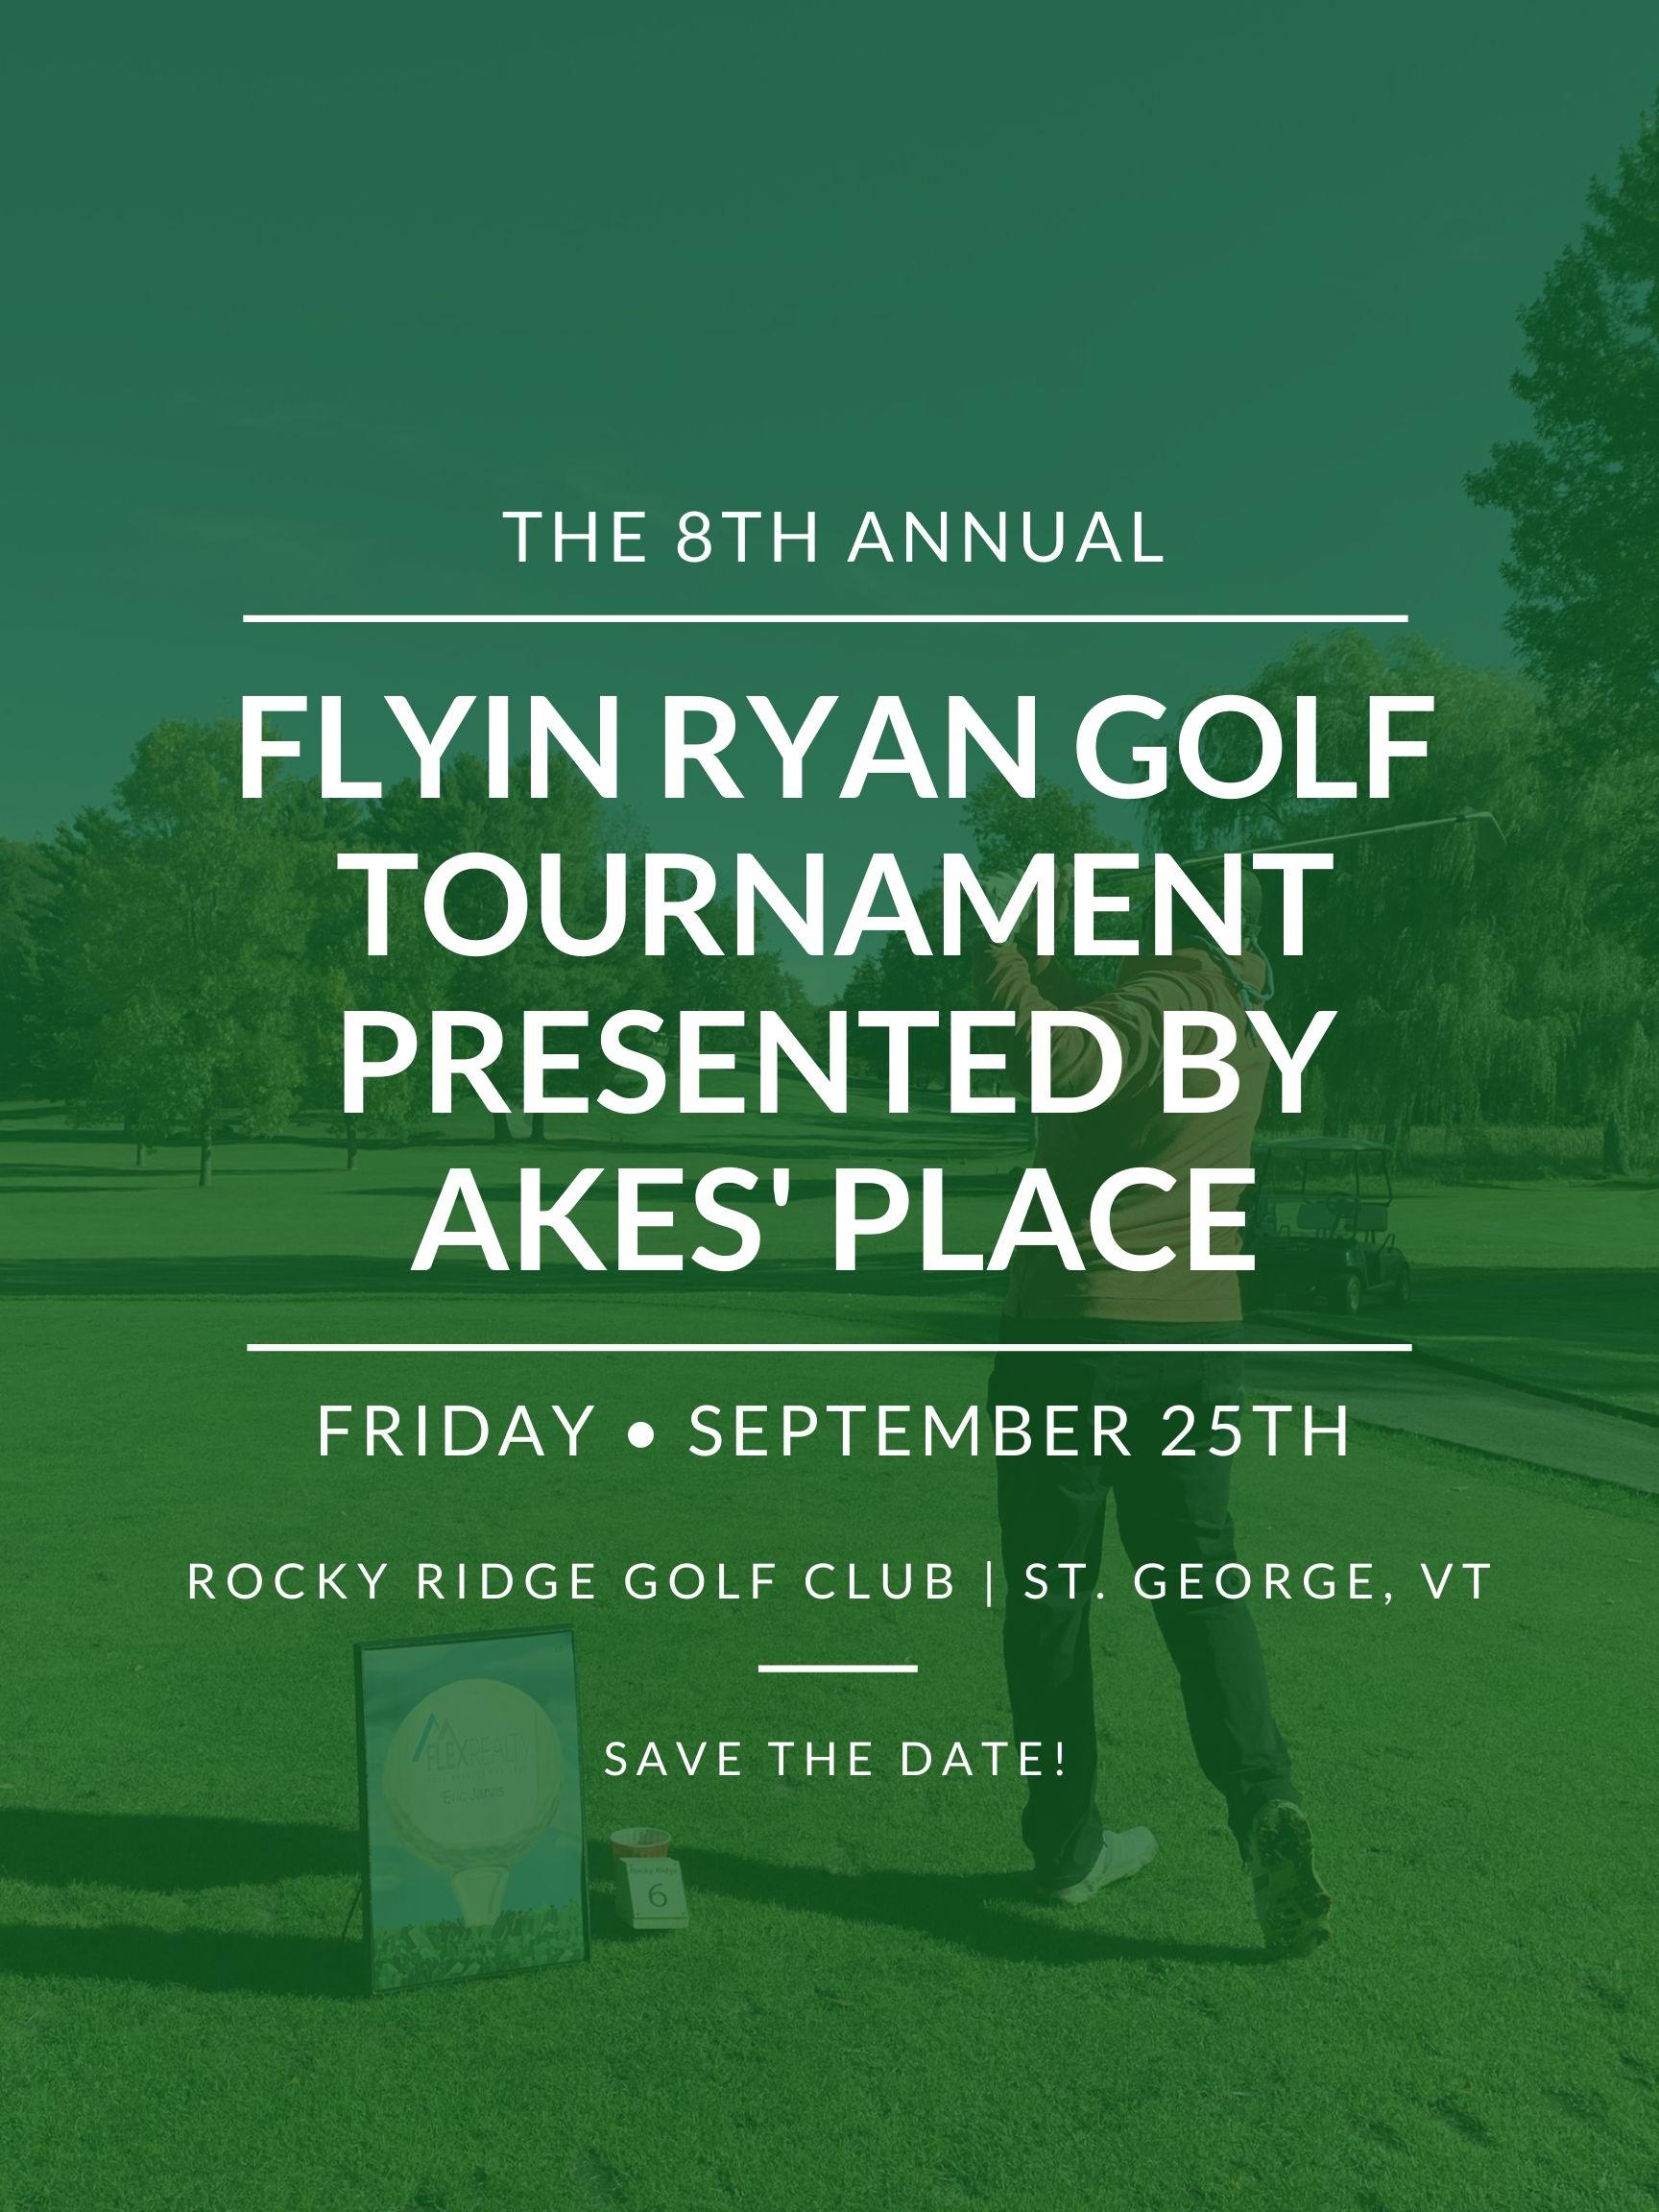 Flyin Ryan Golf Tournament